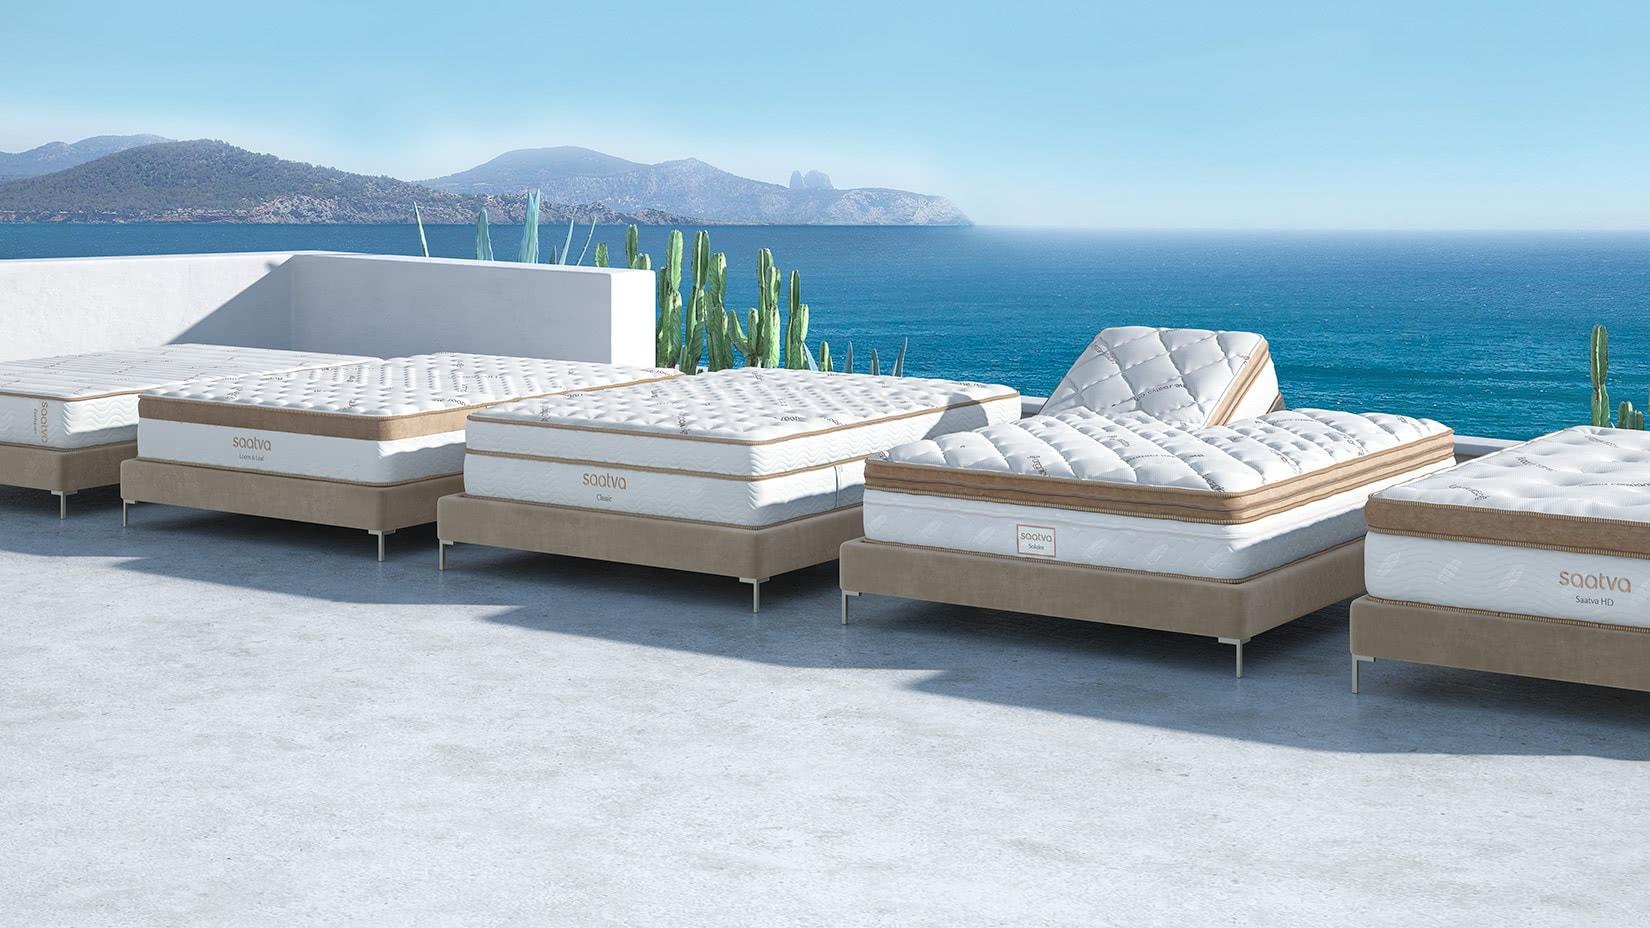 Saatva vs Casper luxury mattress reviews - Luxe Digital